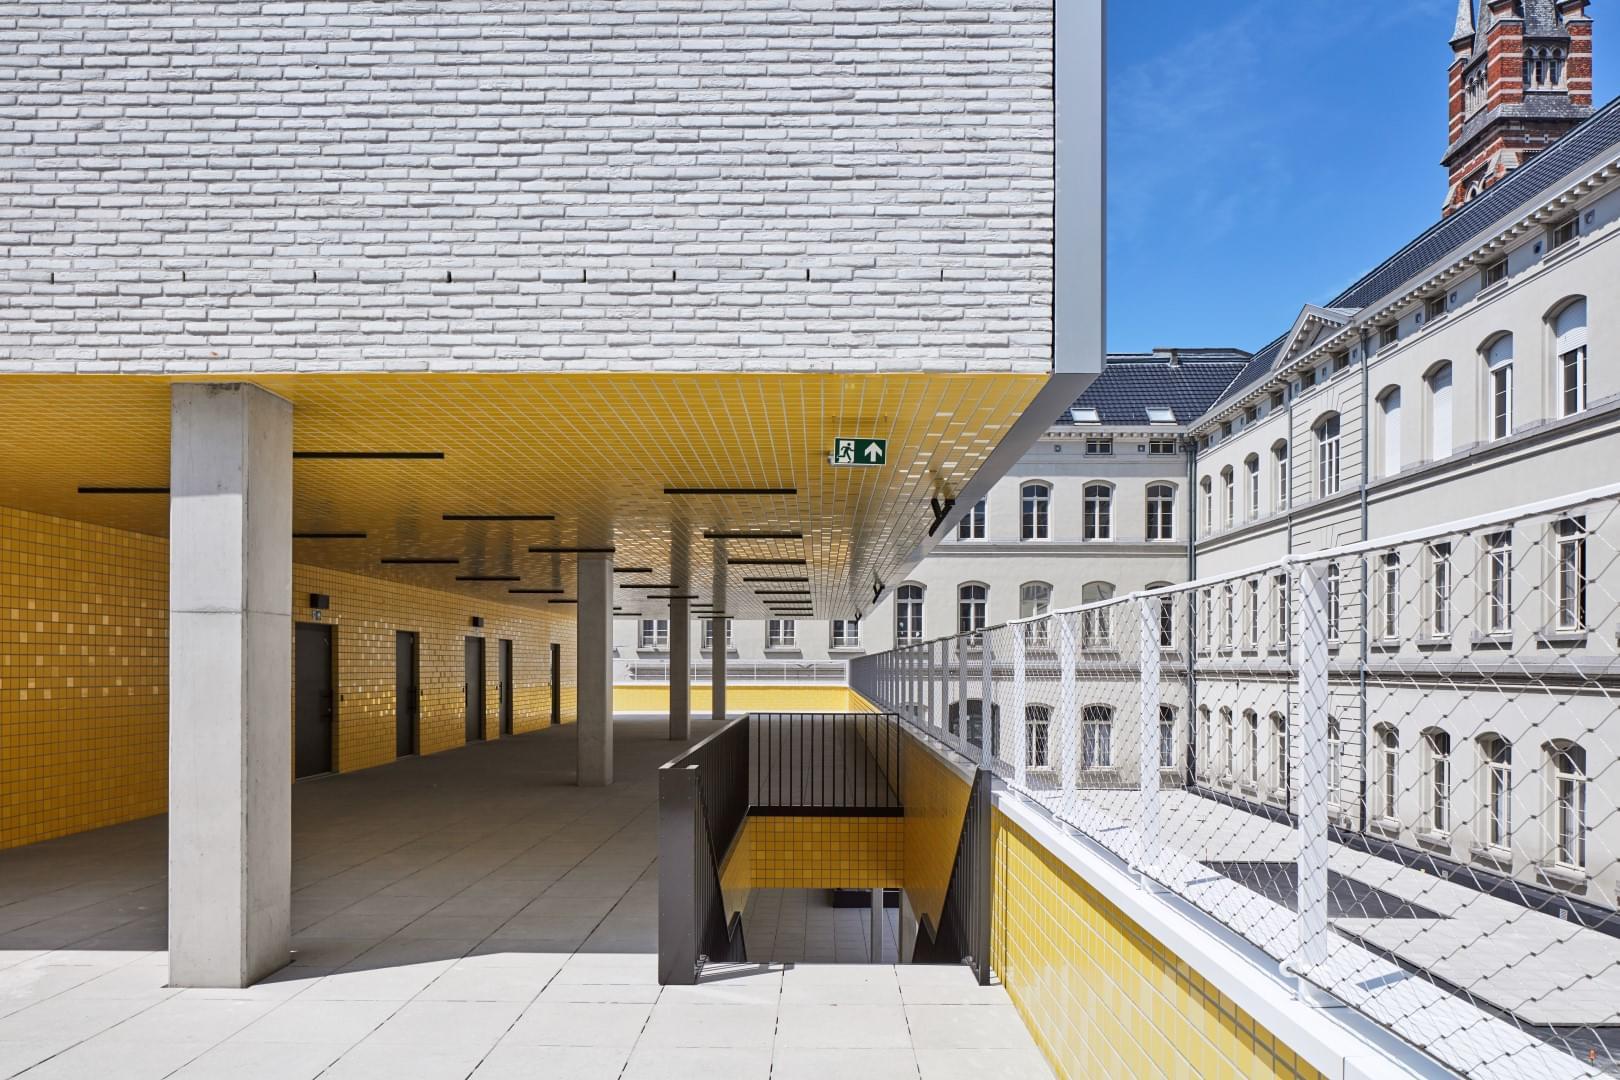 Extension_Onze-Lieve-Vrouwecollege_archiles_architecten_Dimitri_Janssens_005 (Large)